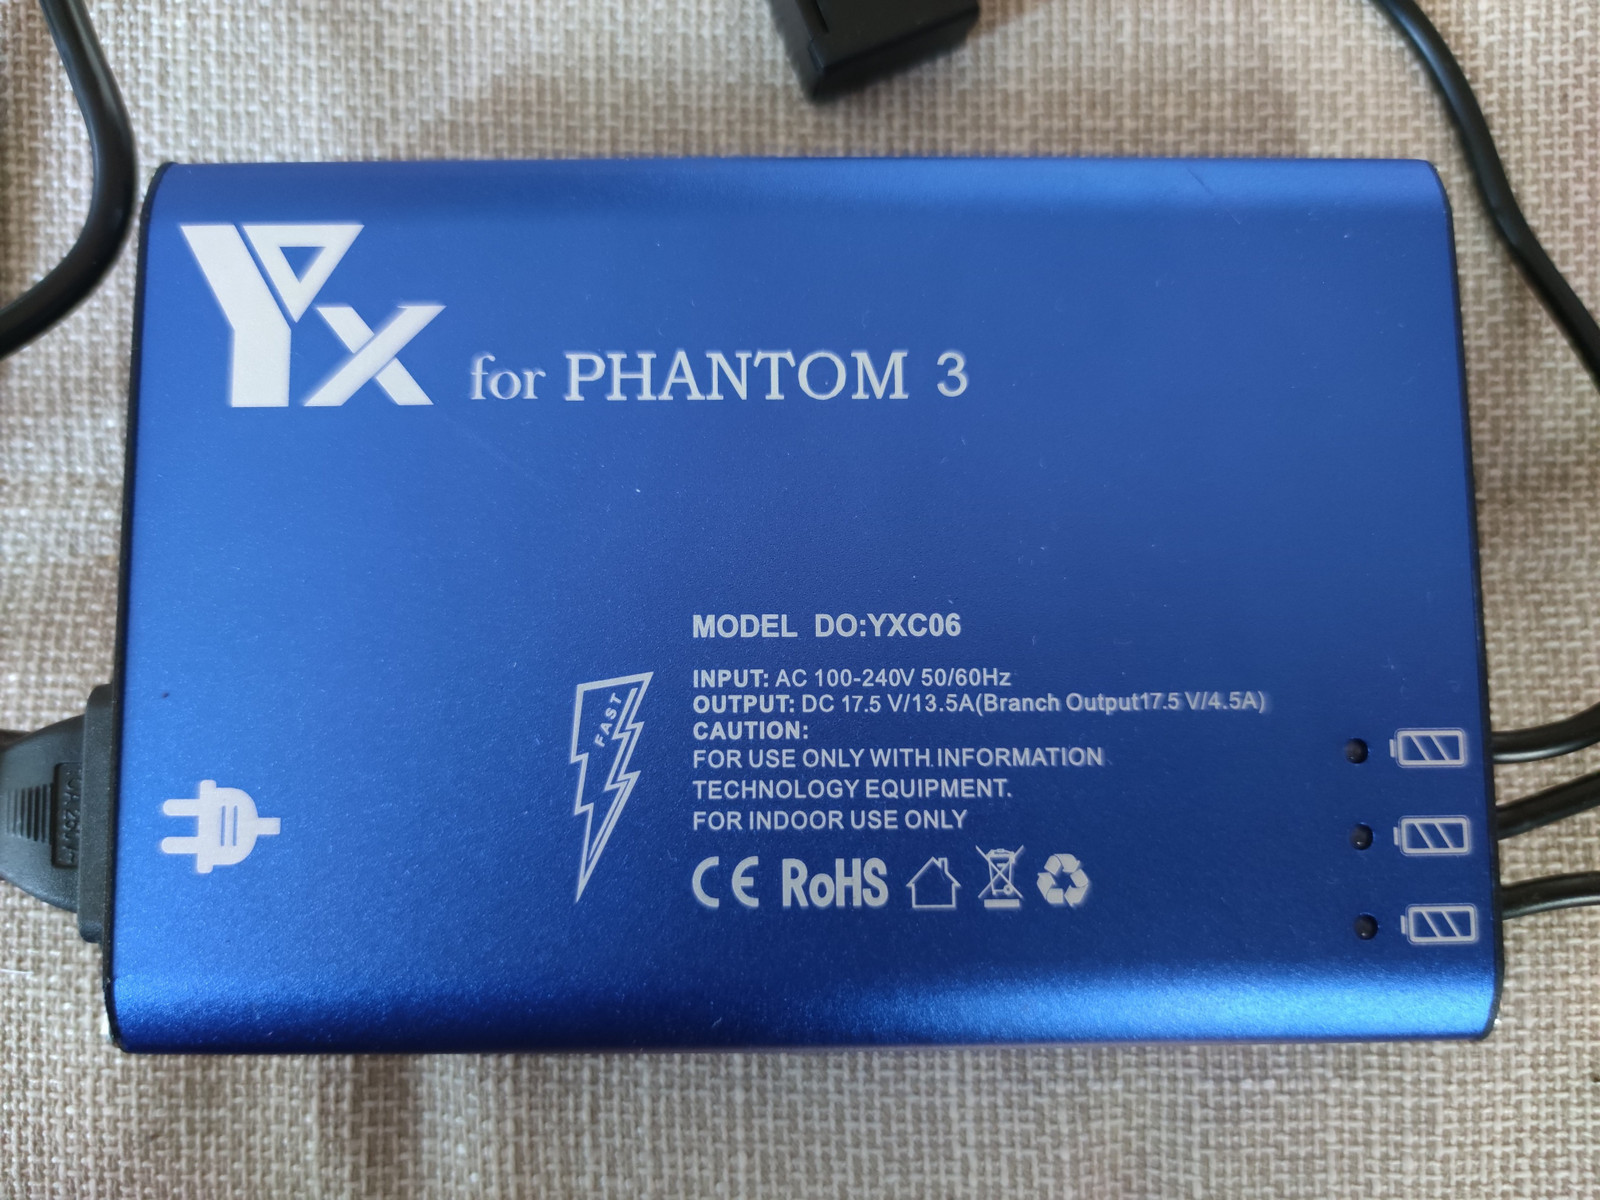 YX 5 i 1 lader for DJI Mavic Pro | FINN.no